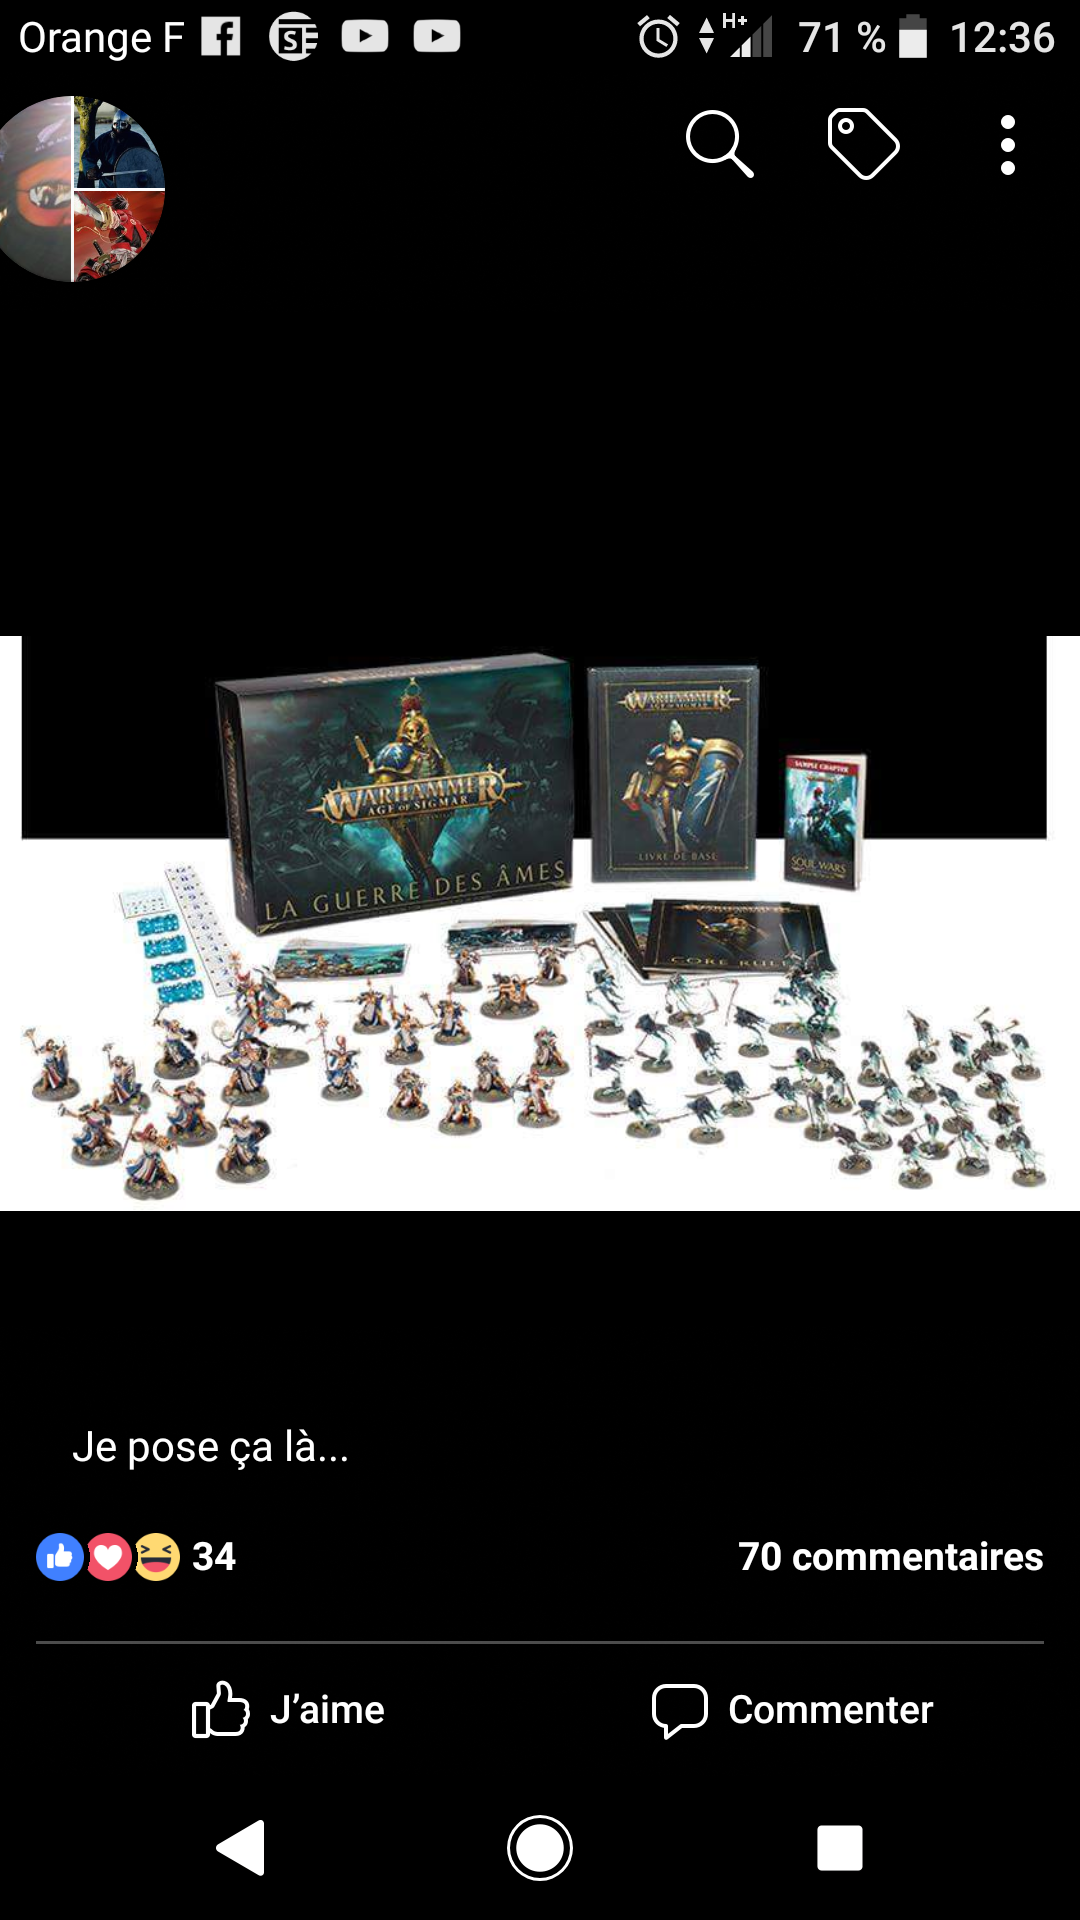 Nouveautés Warhammer Battle - Page 27 Screen10